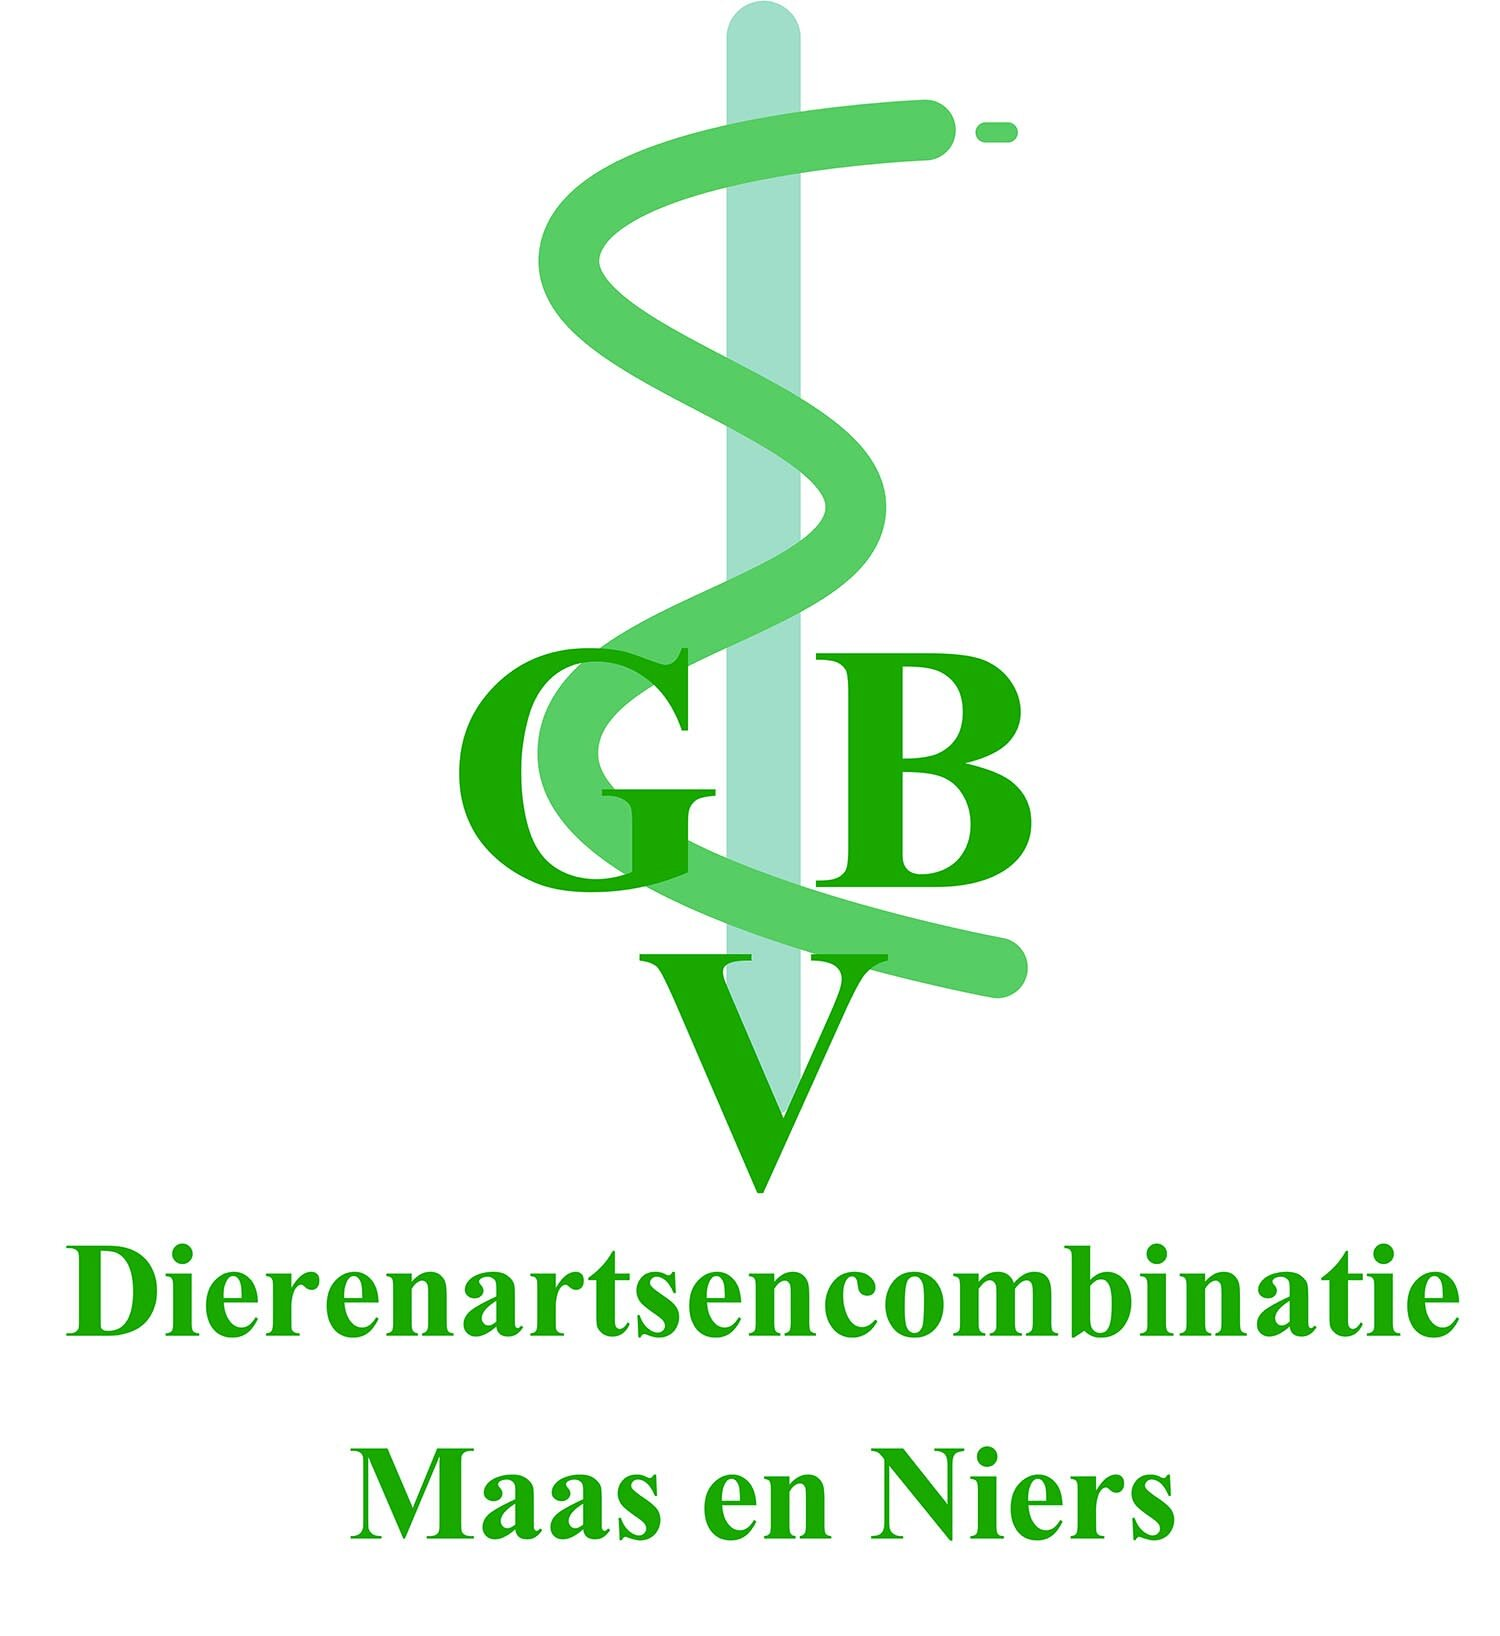 Dierenkliniek Bergen | Dierenartsencombinatie Maas en Niers